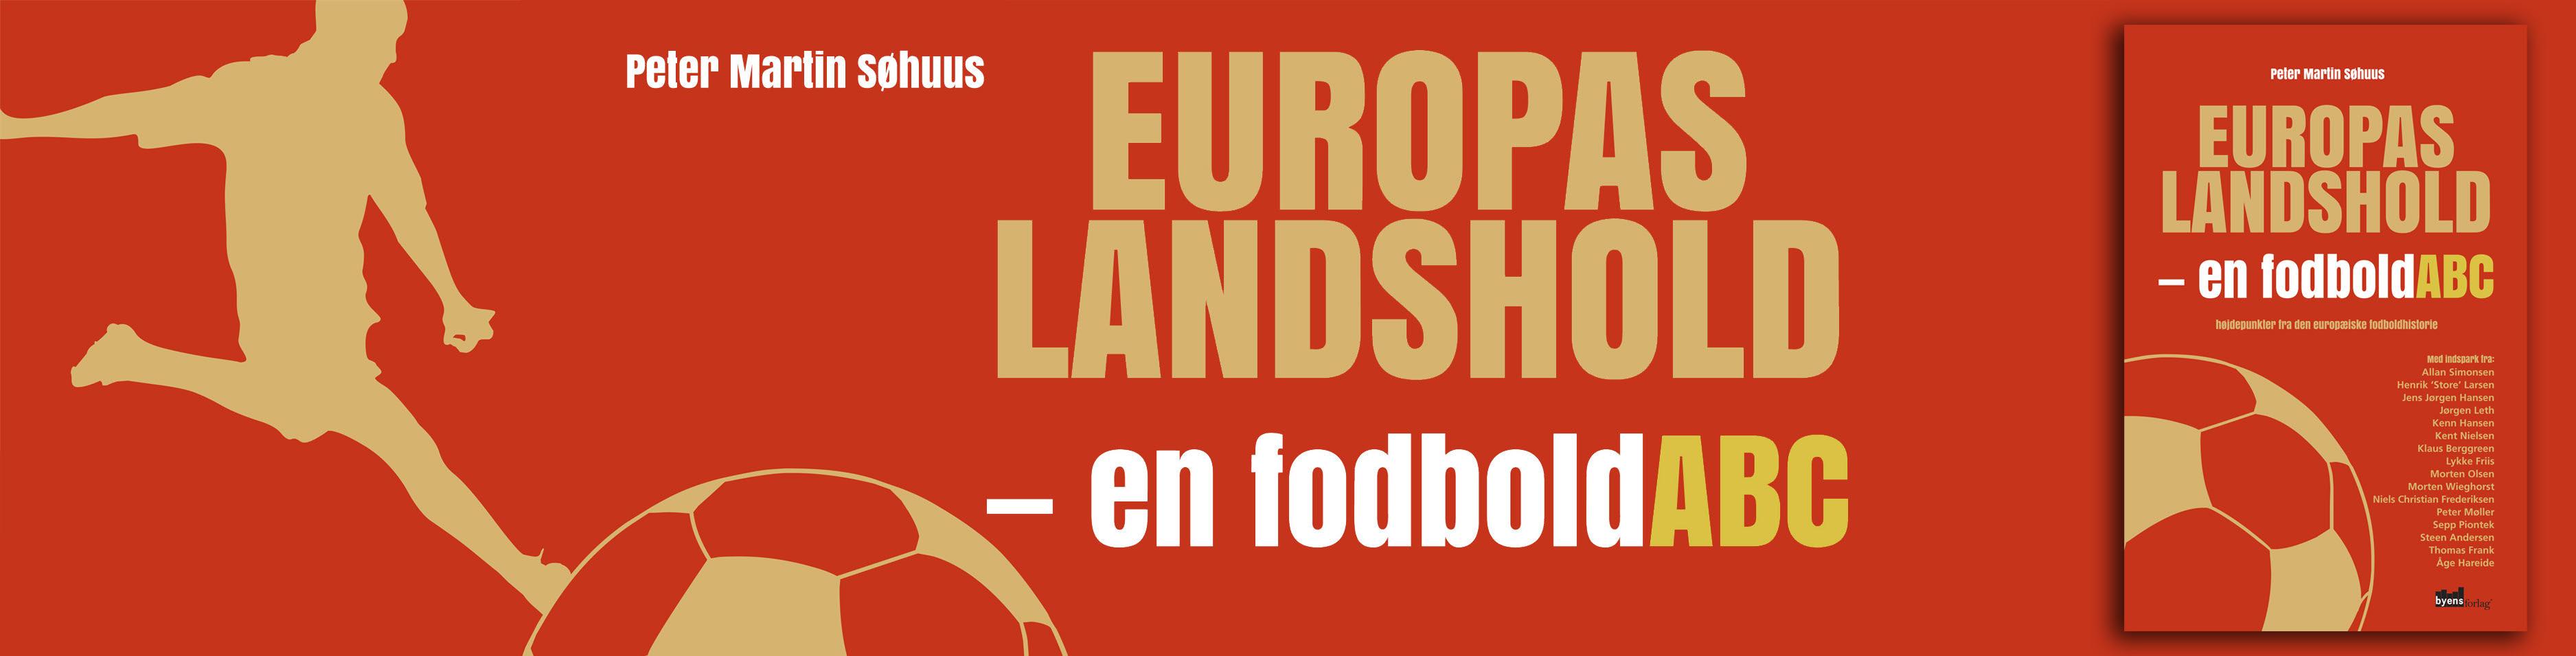 EUROPAS LANDSHOLD